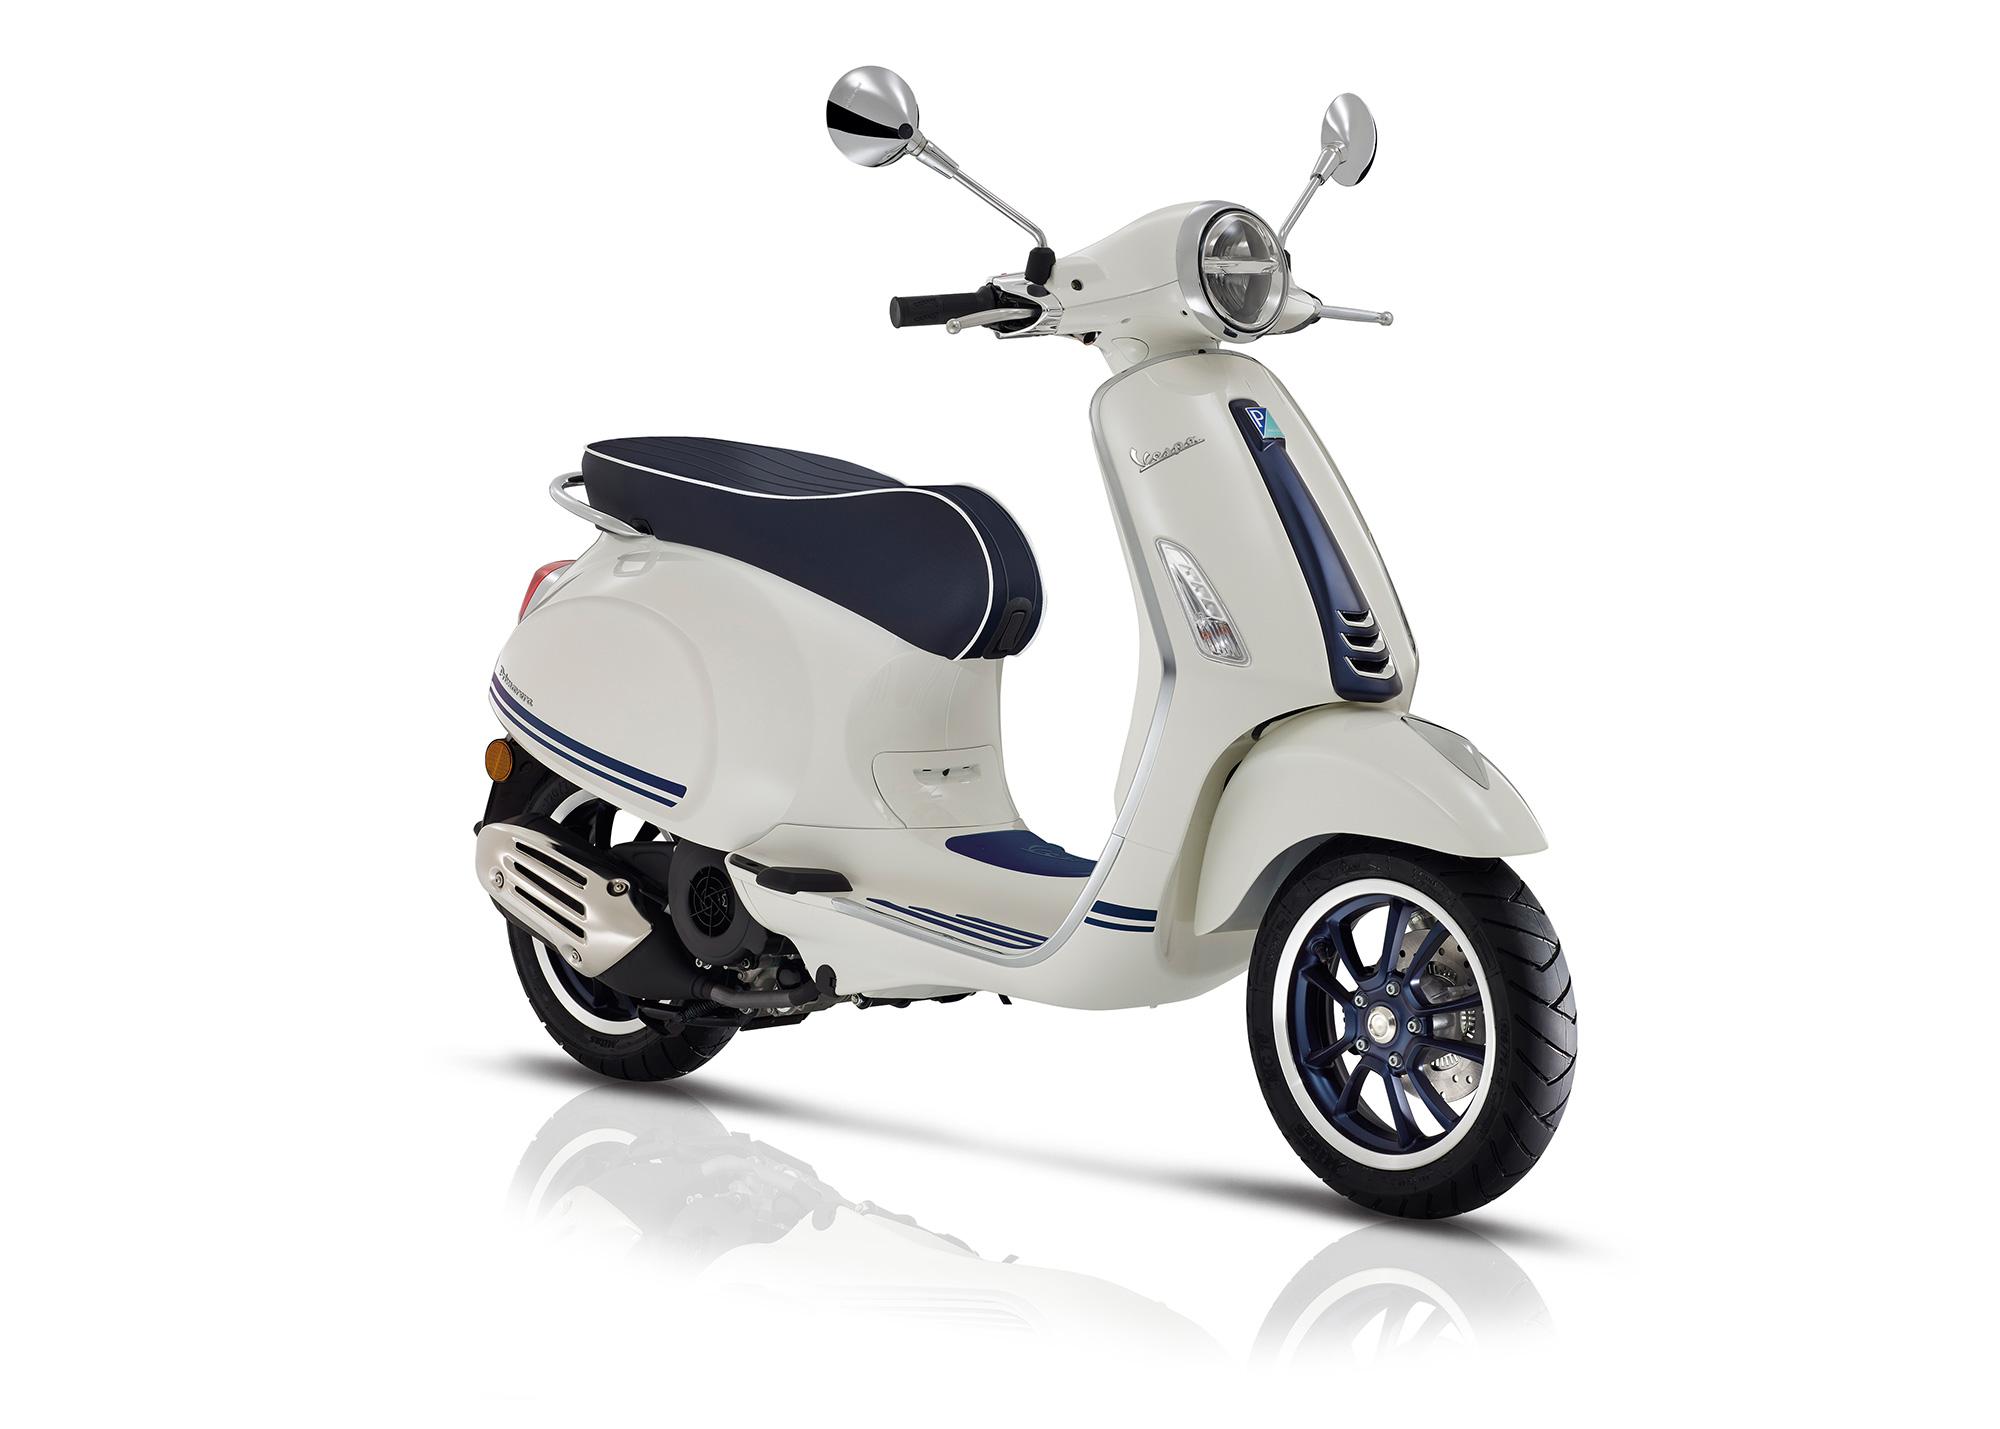 Zweirad-Moped-Vespa